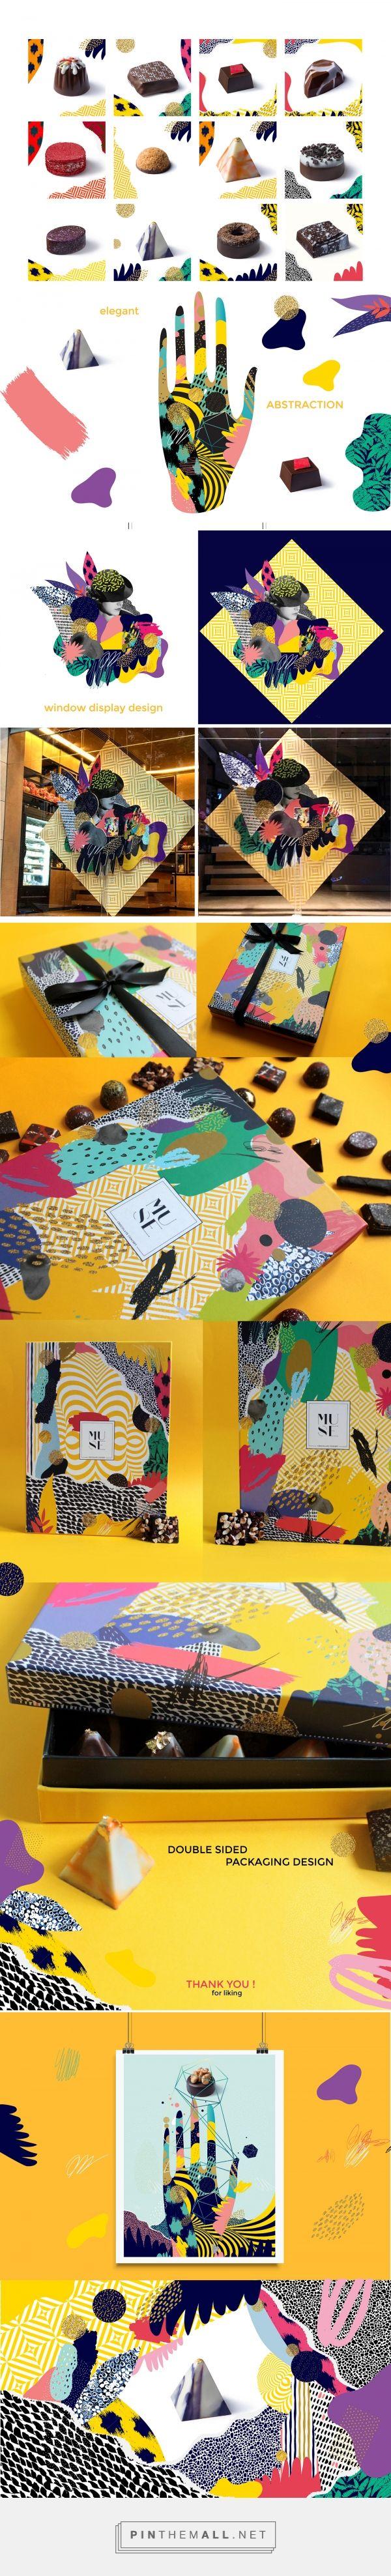 GRAFIK CHIK / chocolate packaging by Mo Kalache